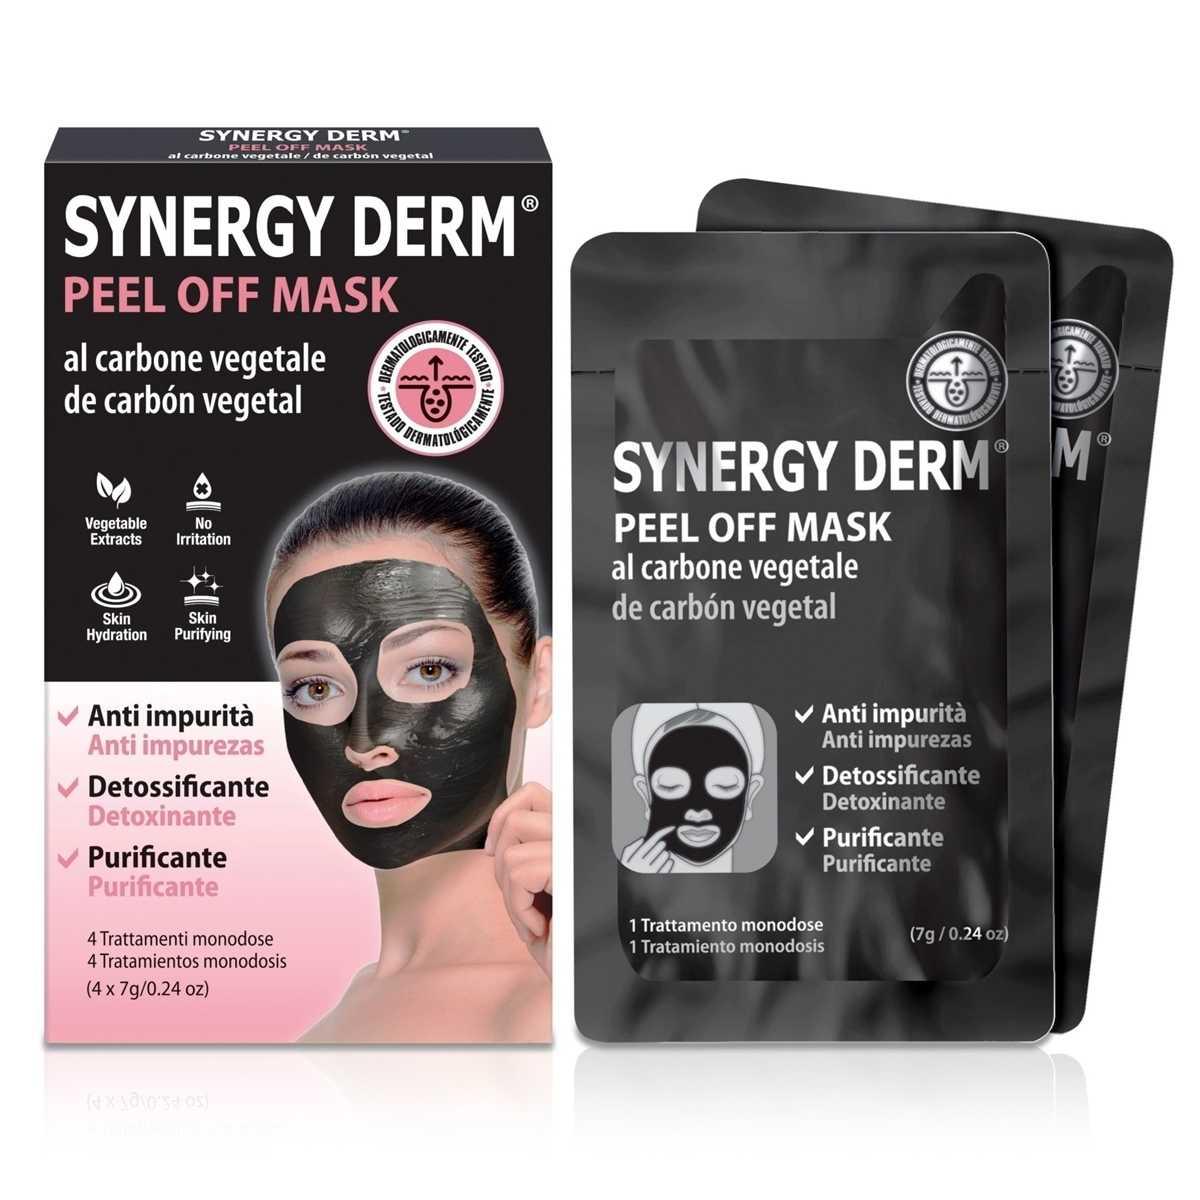 Synergy Derm - Peel Off Mask